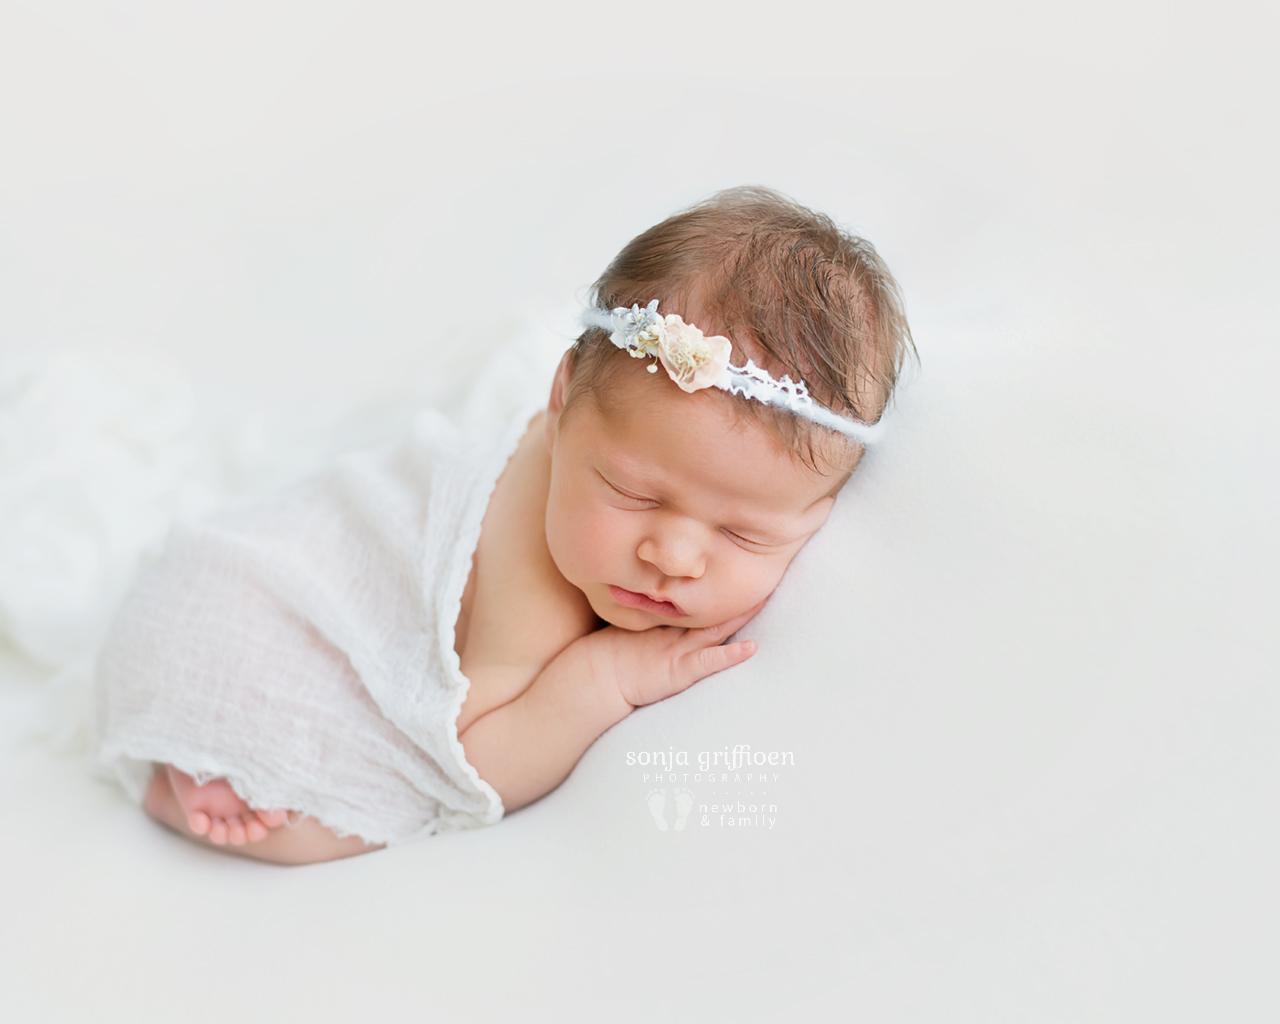 Cleo-Newborn-Brisbane-Newborn-Photographer-Sonja-Griffioen-17.jpg